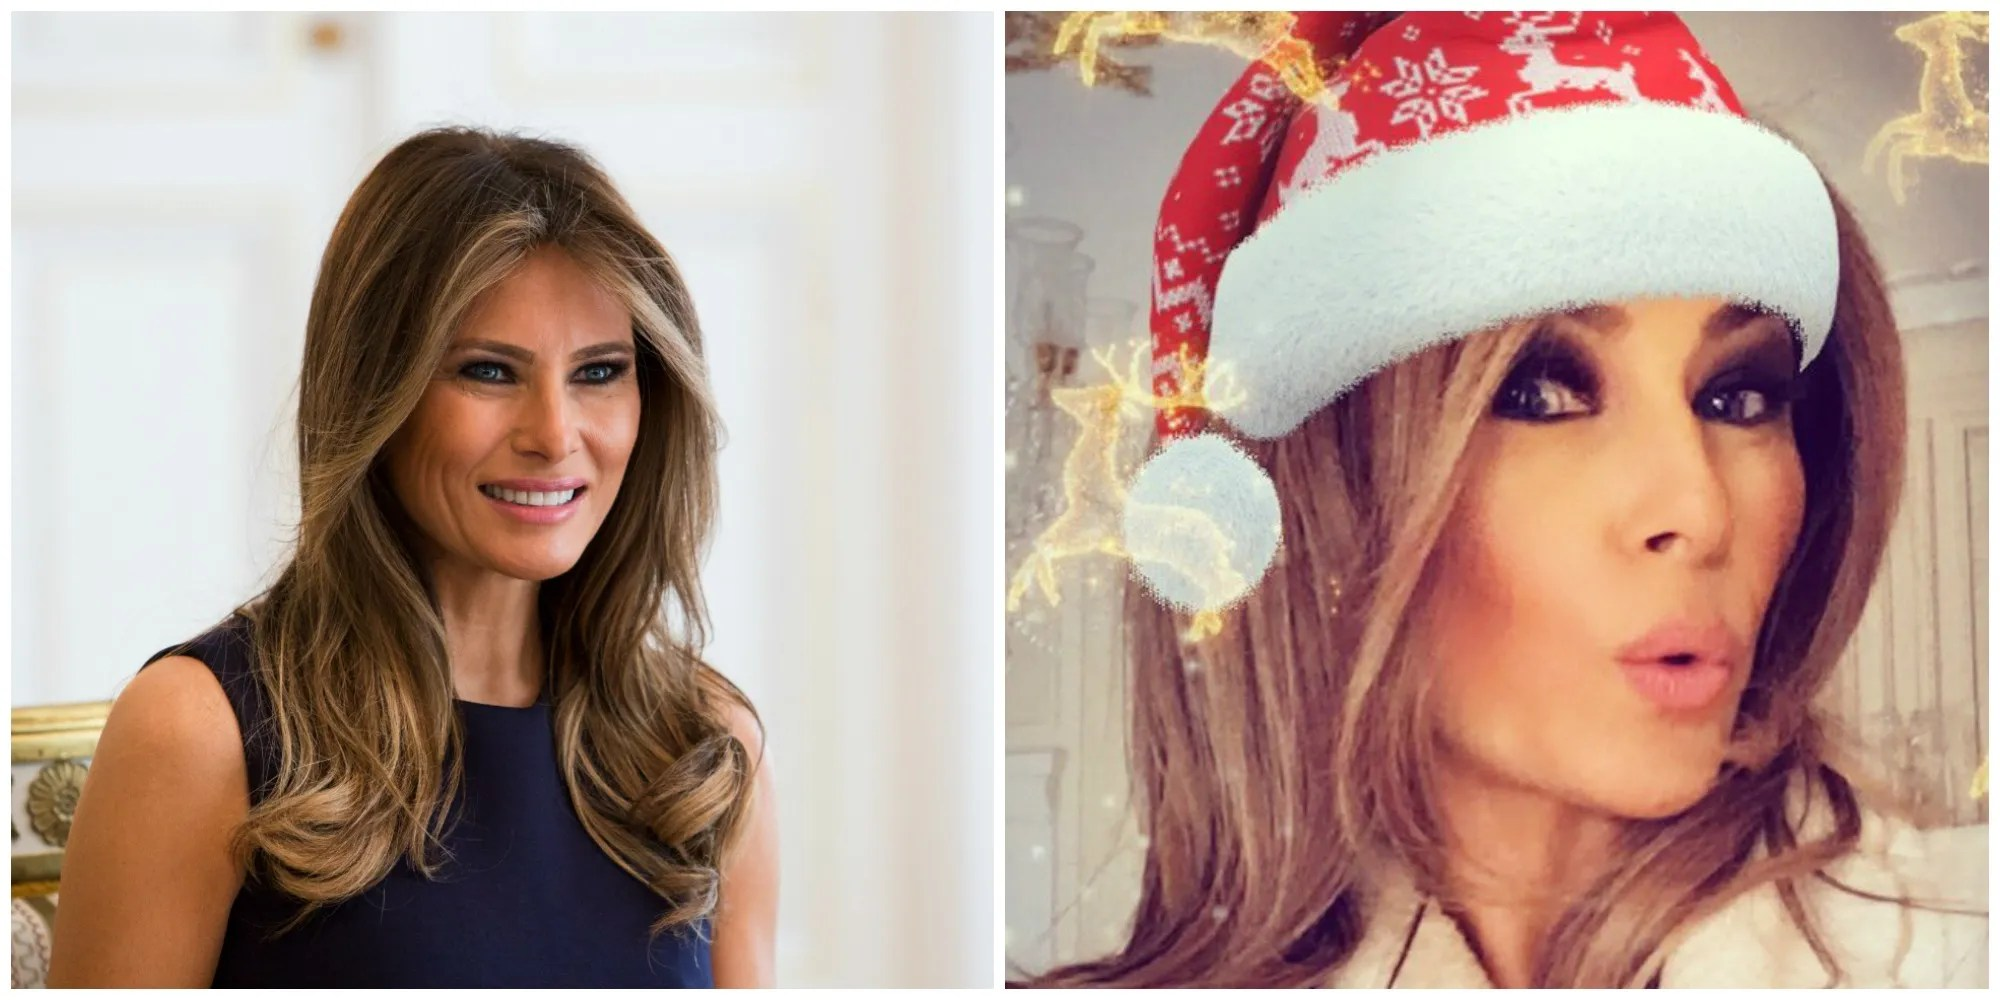 Melania Trump Got Dragged For Her Christmas Selfie Allure